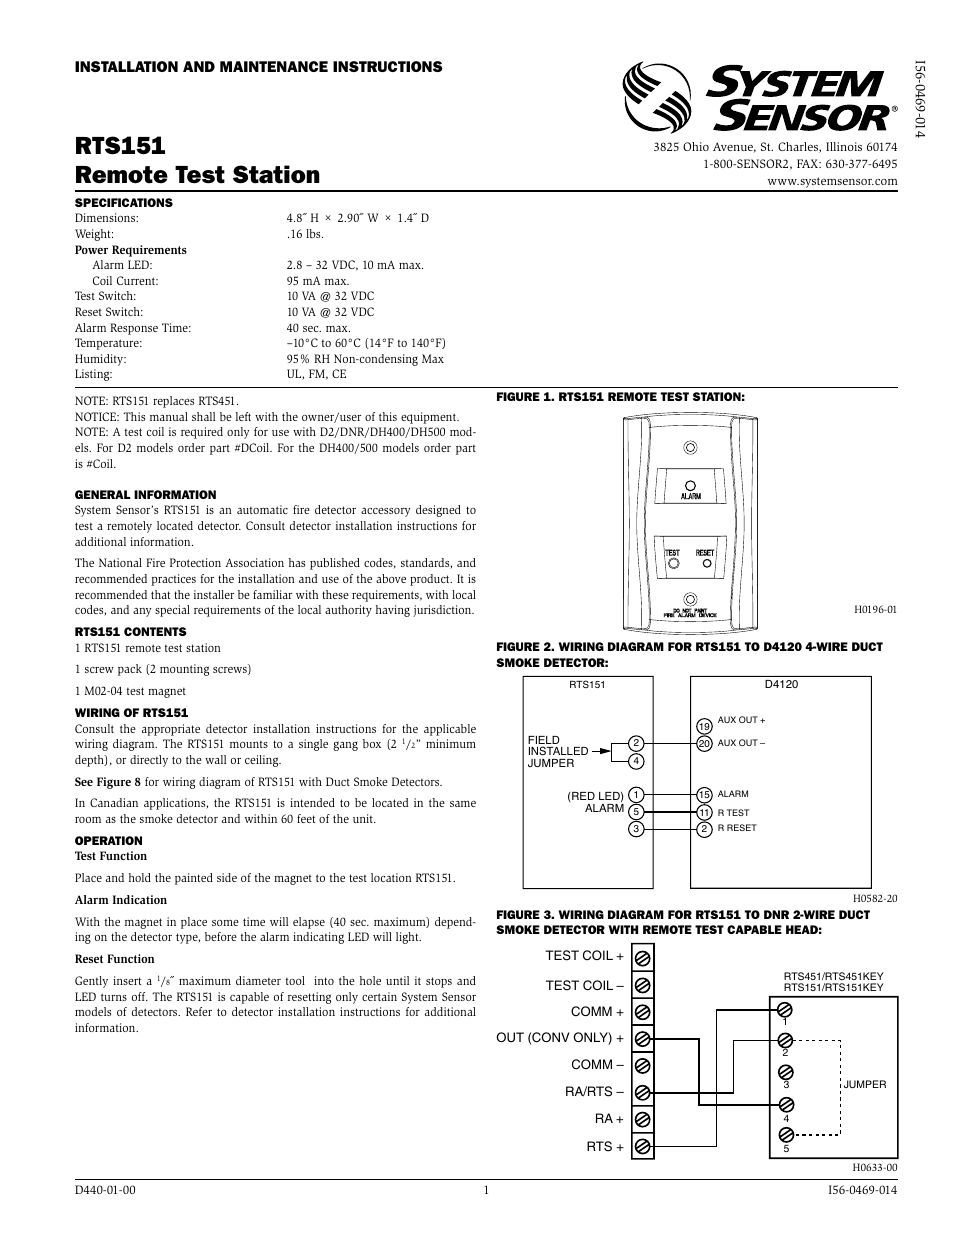 medium resolution of rts451 wiring diagram 21 wiring diagram images wiring maf sensor wiring diagram crankshaft position sensor diagram